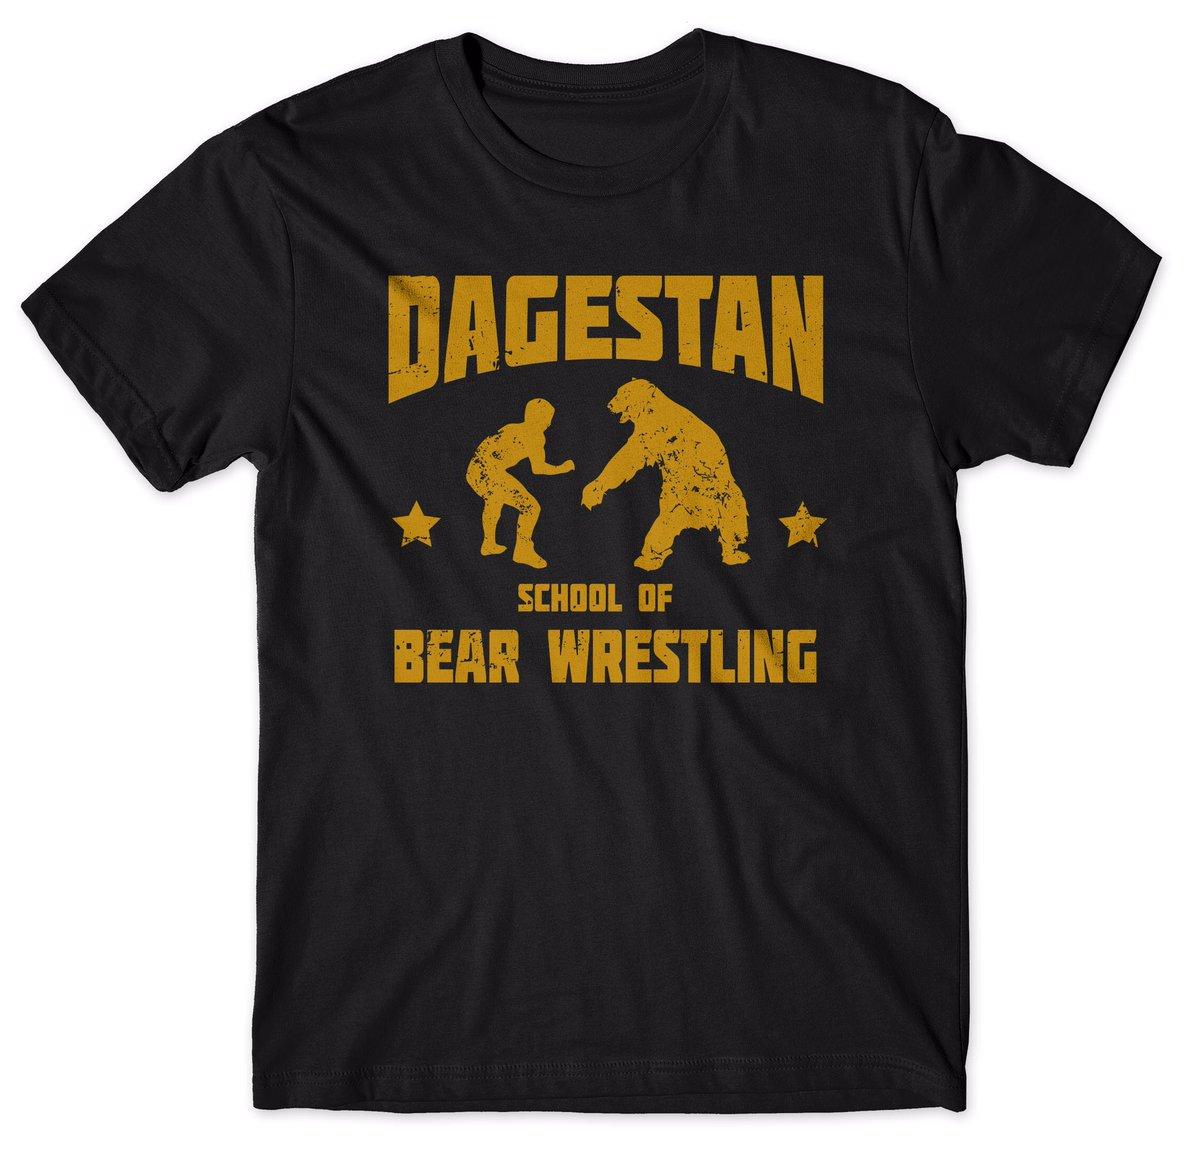 Dagestan Bear 🐻 Wrestling 🤼♂️ Tees  $20 w/ Code: USA  https://t.co/7Eix0wLscY   #MMATwitter #khabibnurmagomedov https://t.co/iozzFQfLBx